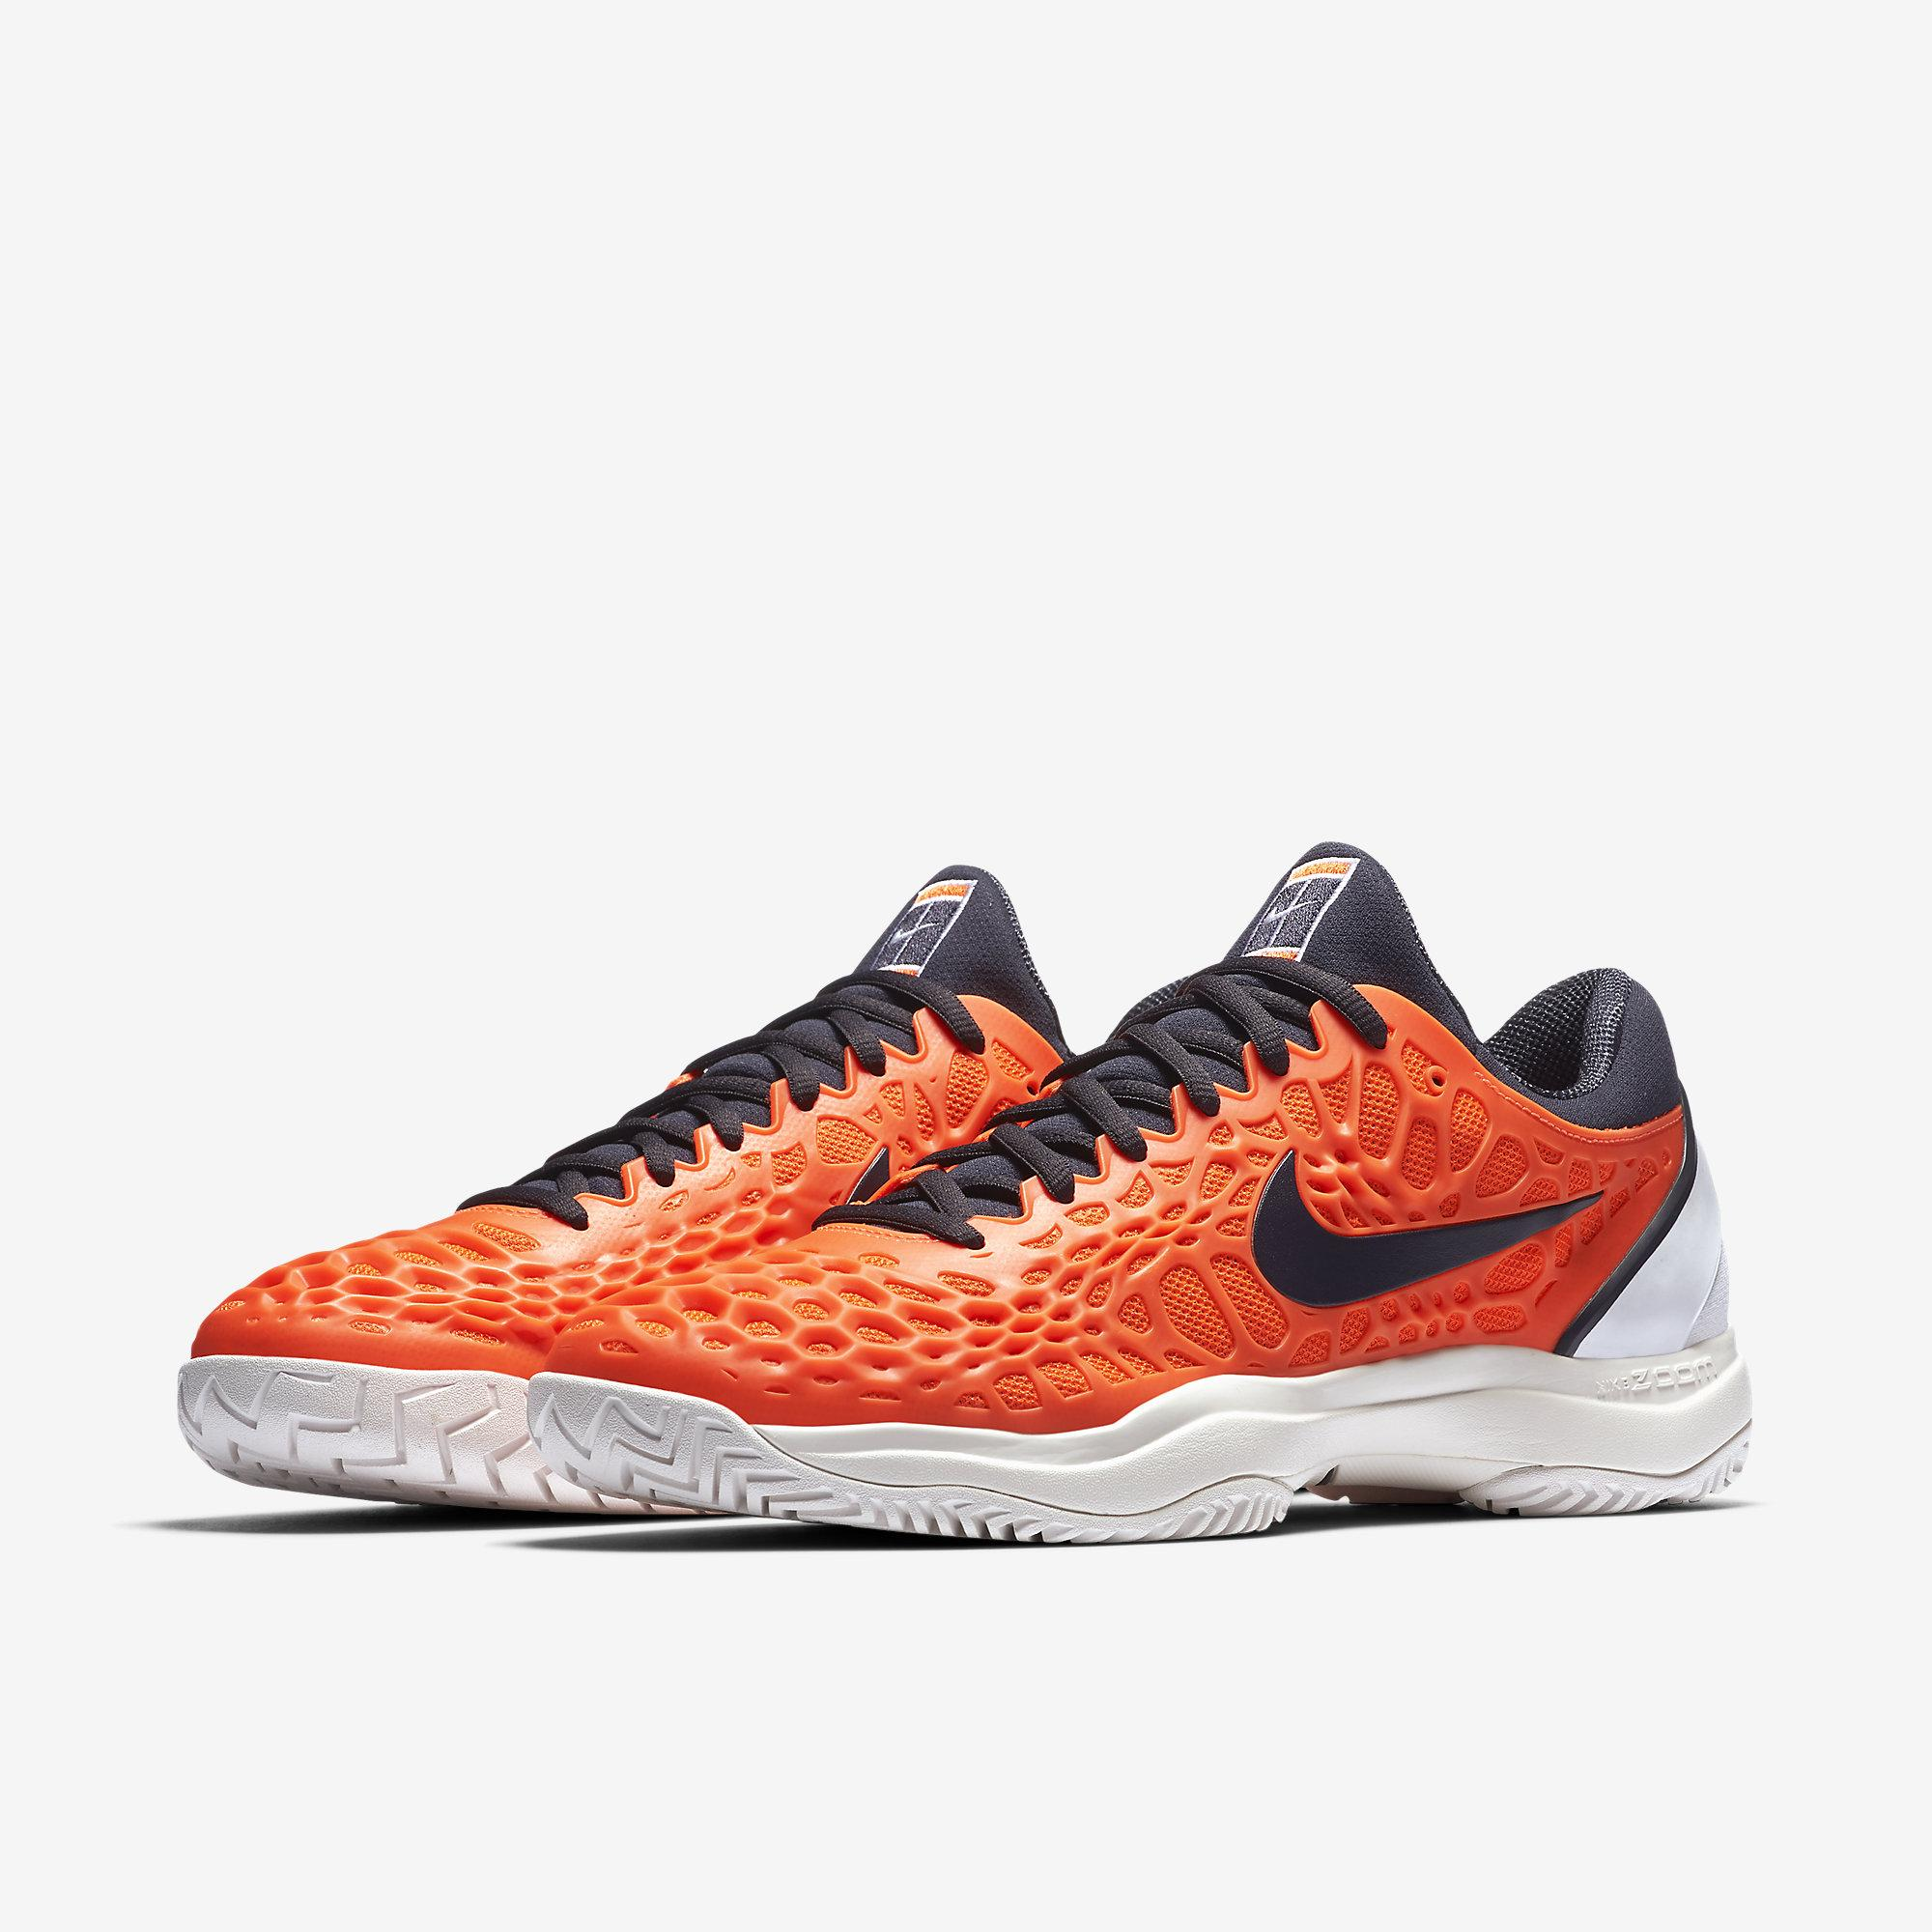 78da162e70a6a Nike Mens Zoom Cage 3 Rafa Tennis Shoes - Hyper Crimson White ...